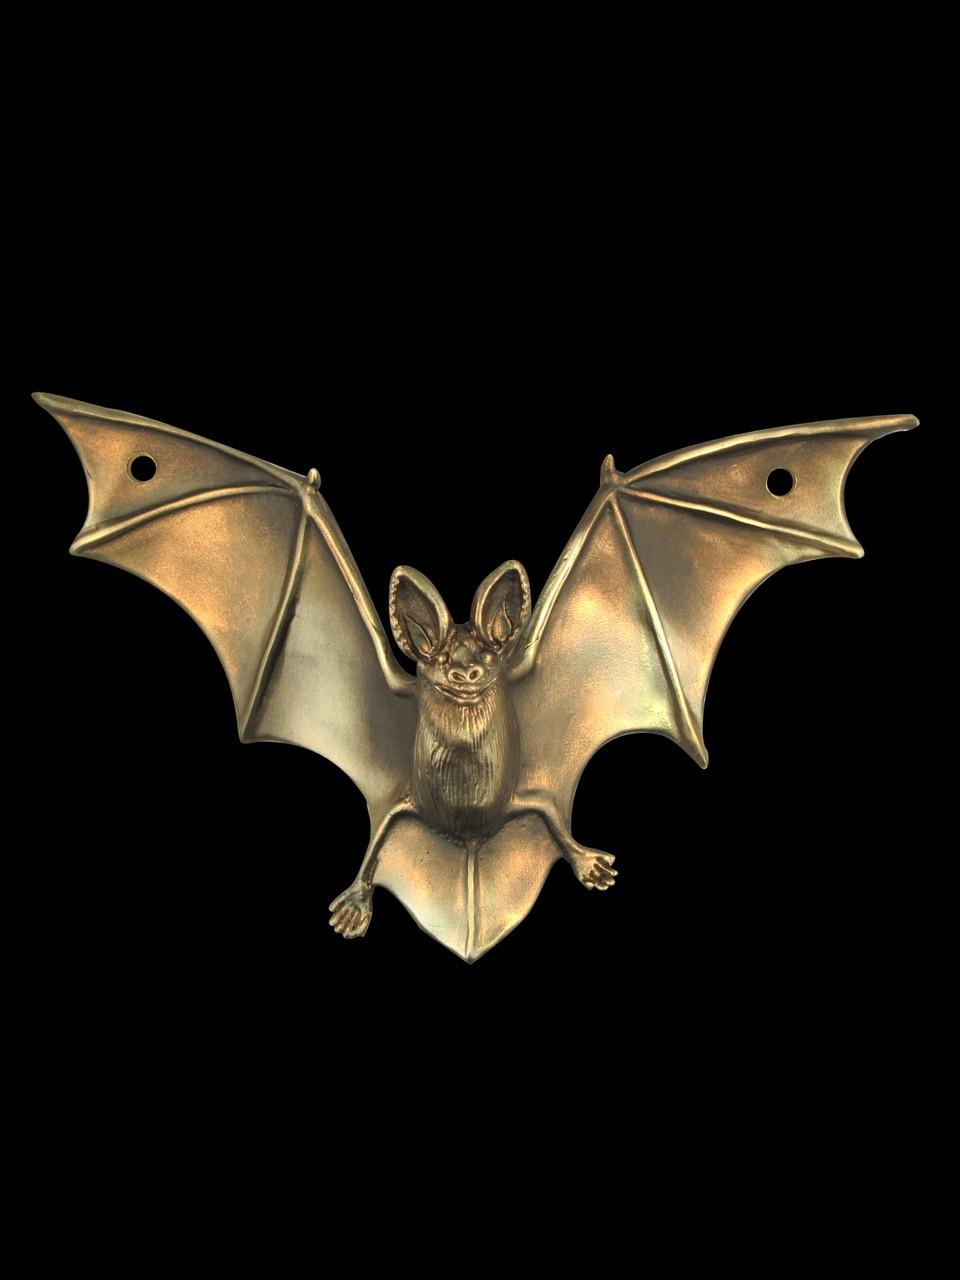 Bat Drawer Pull Sculpture - Bronze - Marty Magic Store